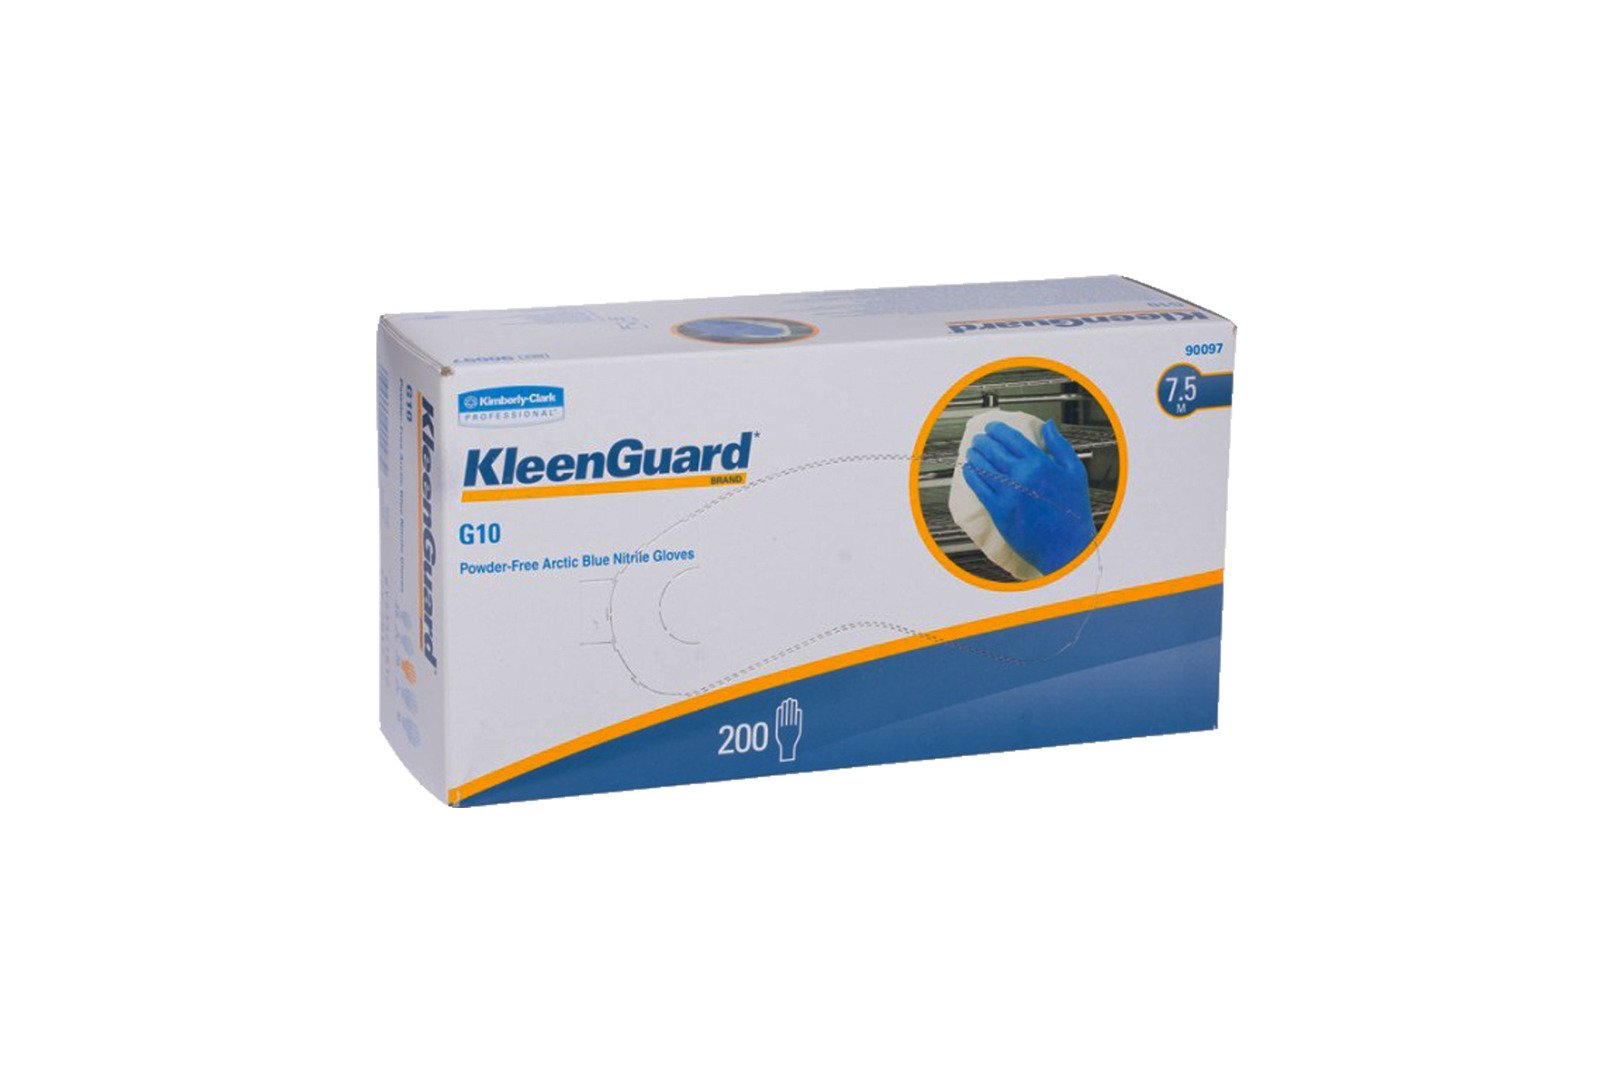 KleenGuard G10 Powder-Free Arctic Blue Nitrile Gloves 7.5 Size M 200 pcs